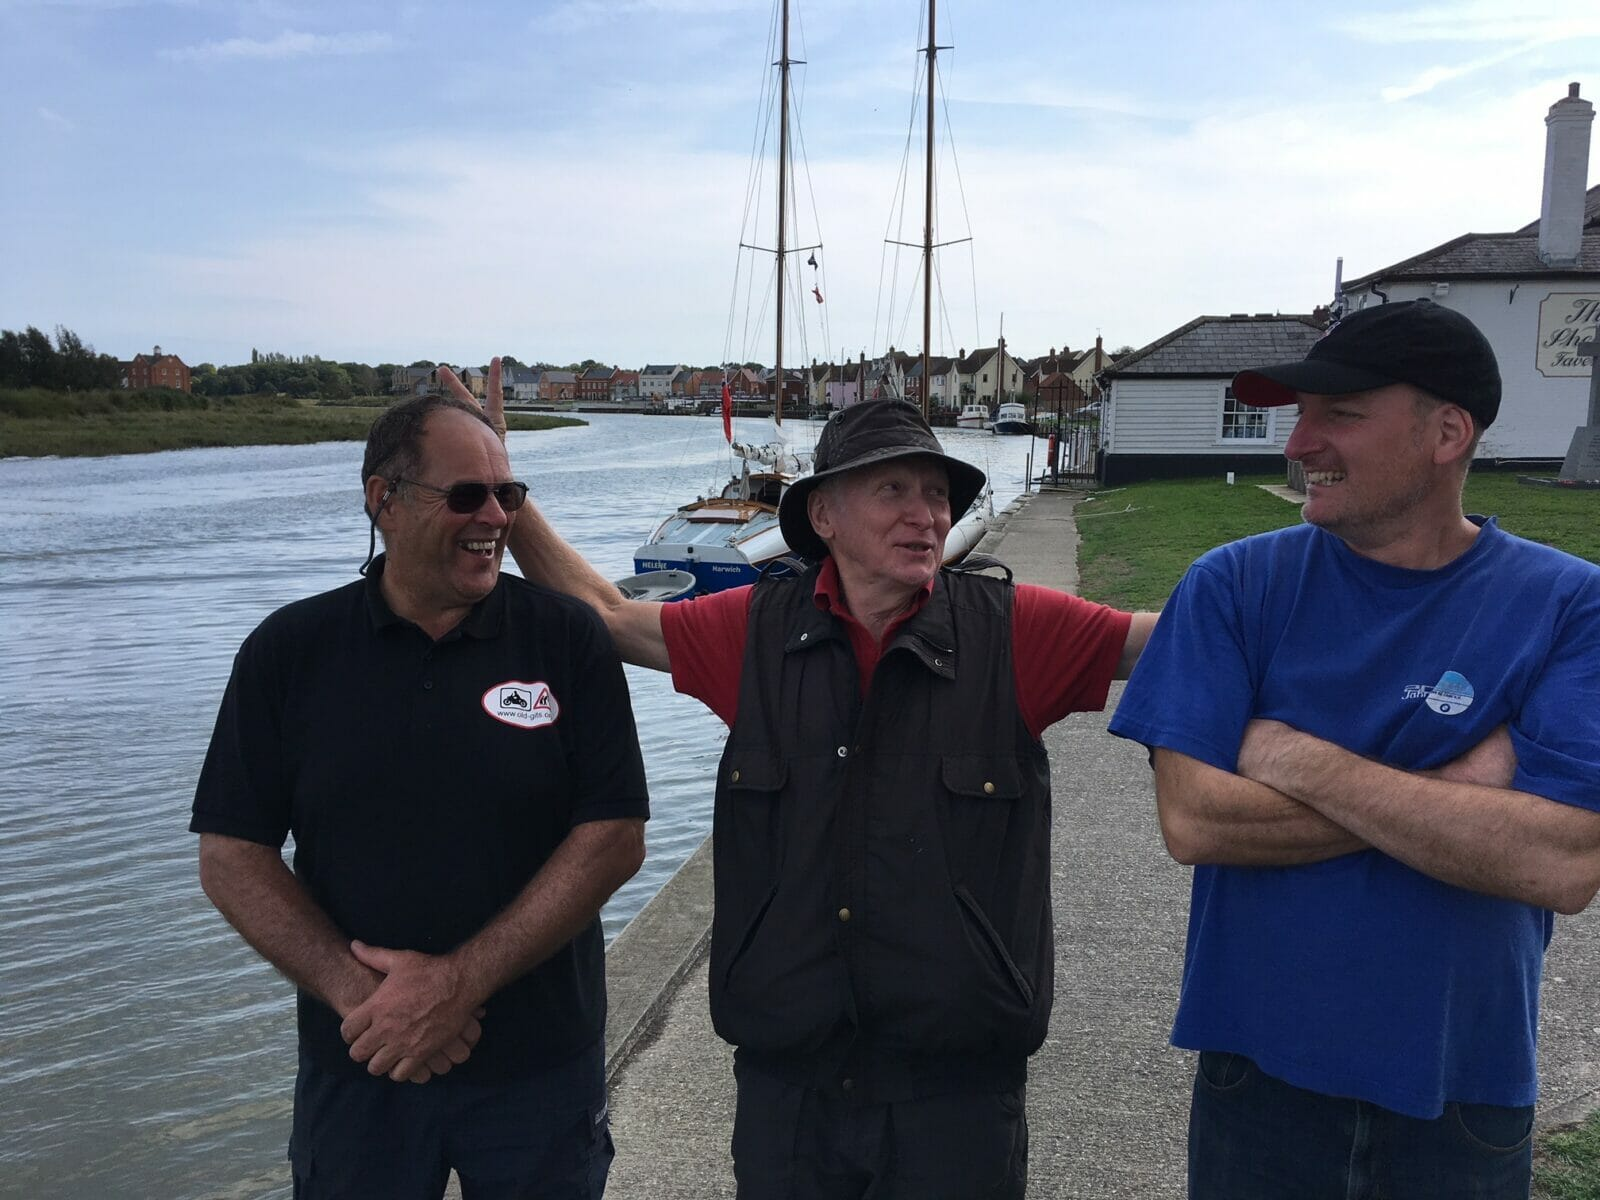 2018 CIC Alistair, Bernard and Nick